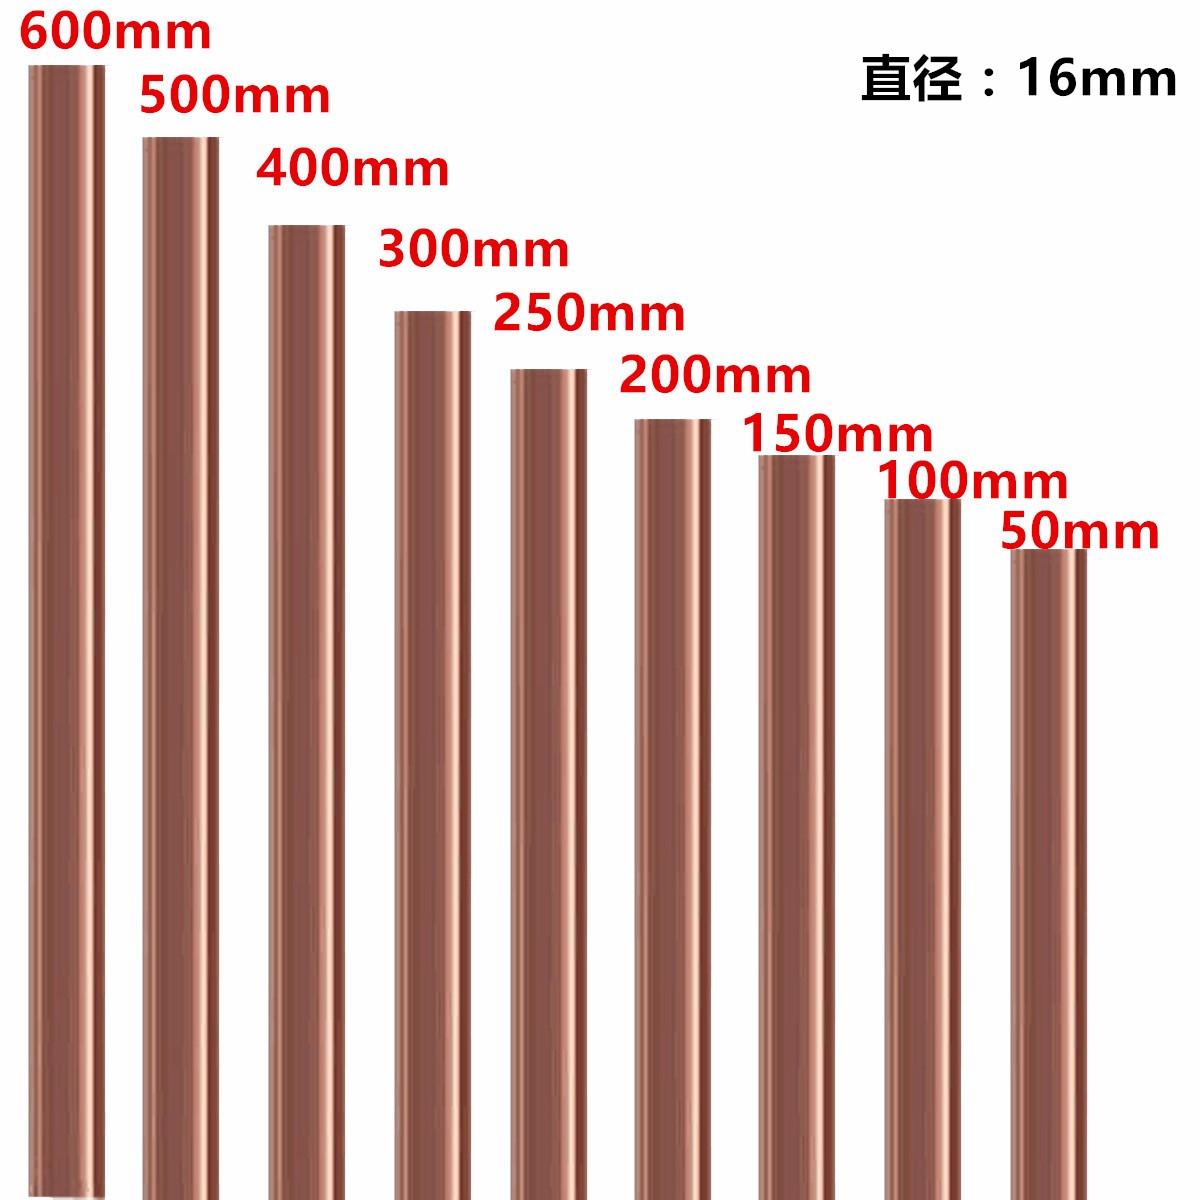 150mm Copper Round Bar Rod 3mm 25mm Diameter Milling  : 790c853e 7e1a 18b9 4e40 471501587e31 from www.lazada.com.my size 1200 x 1200 jpeg 235kB